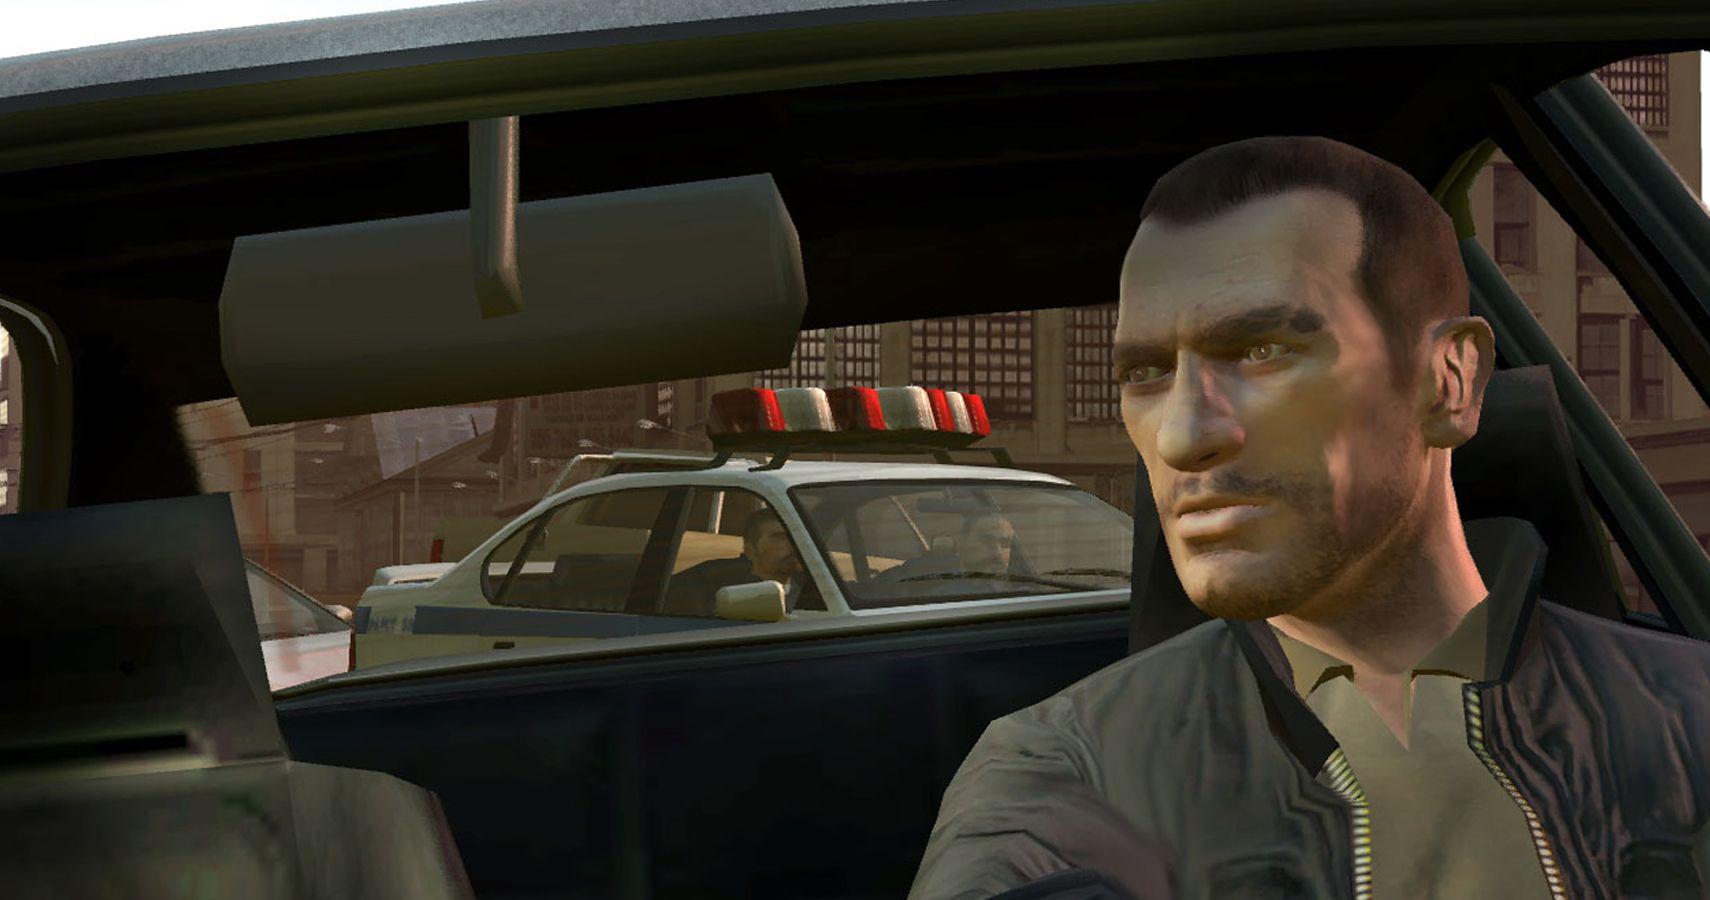 forma Necesito Inmuebles  Grand Theft Auto: 25 Things About Niko Bellic That Make No Sense